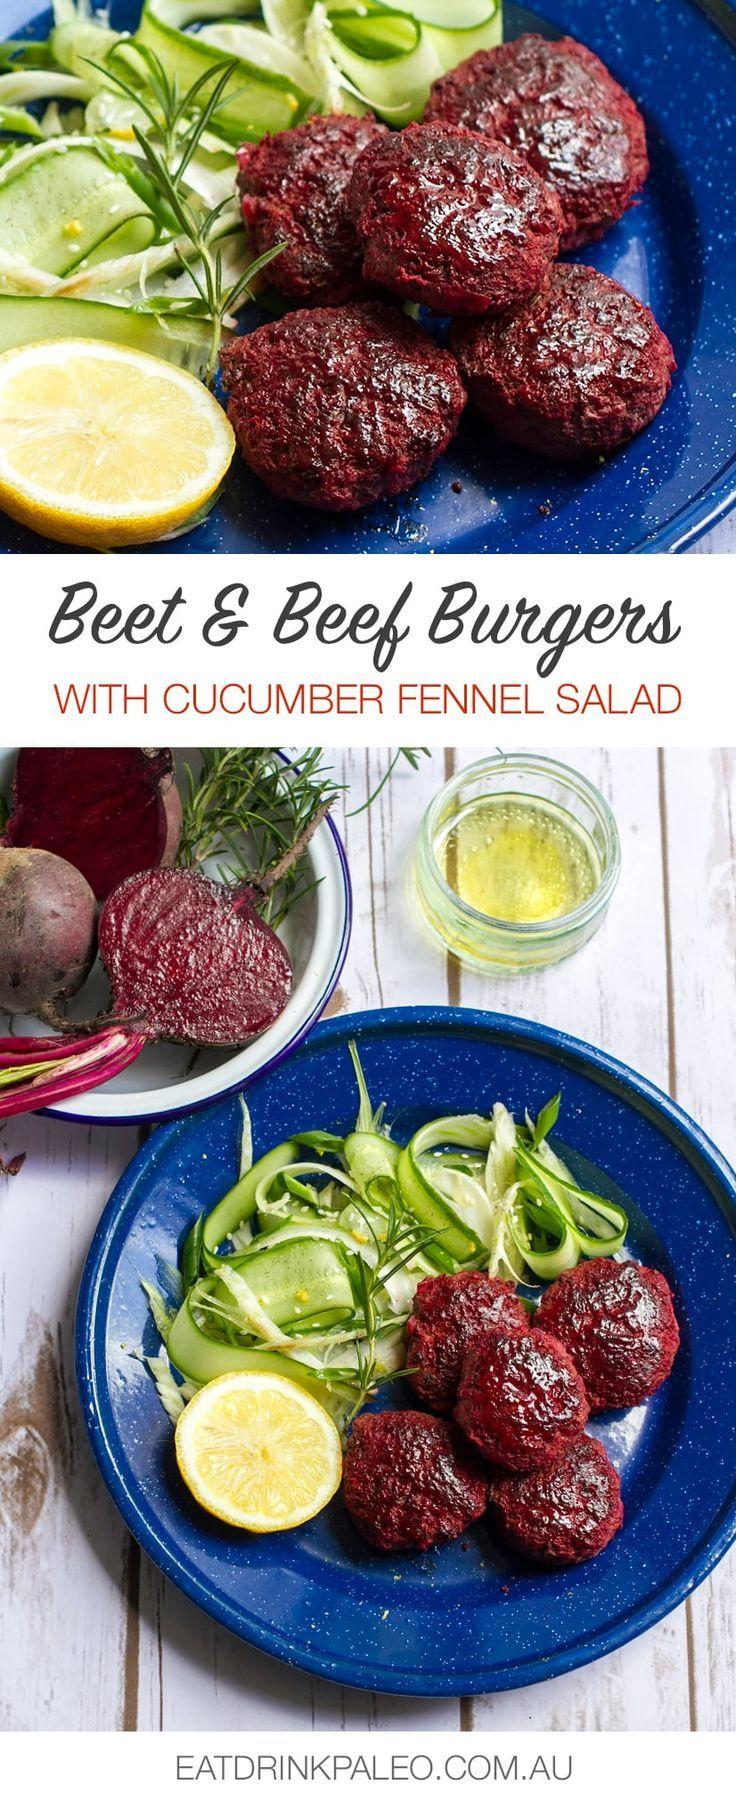 Beetroot and Rosemary Beef Burgers   Paleo, Whole30, Gluten-free Recipe Via http://eatdrinkpaleo.com.au/rosemary-beetroot-burgers-recipe/